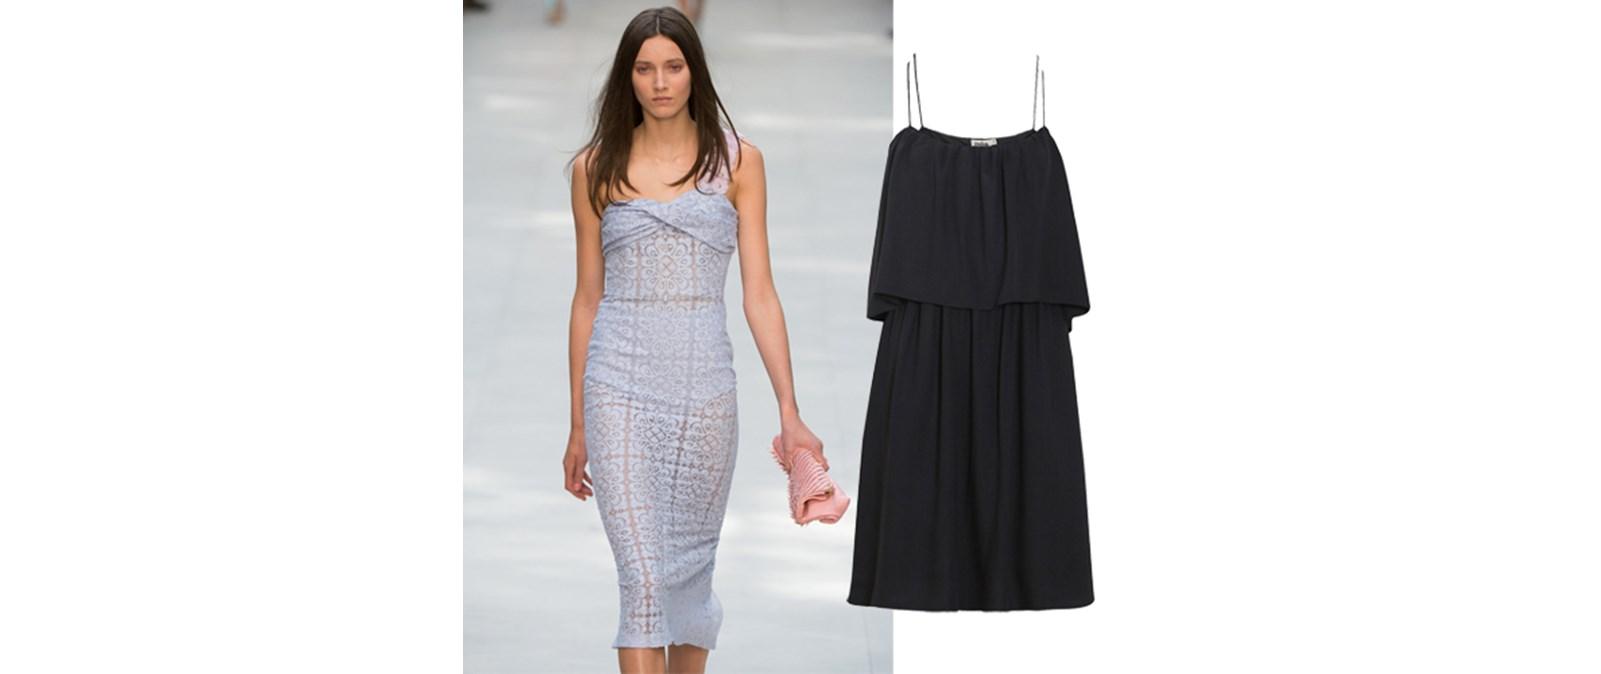 9950abf49b52 Tα 10 φορέματα που θα φοράς όλο το Καλοκαίρι